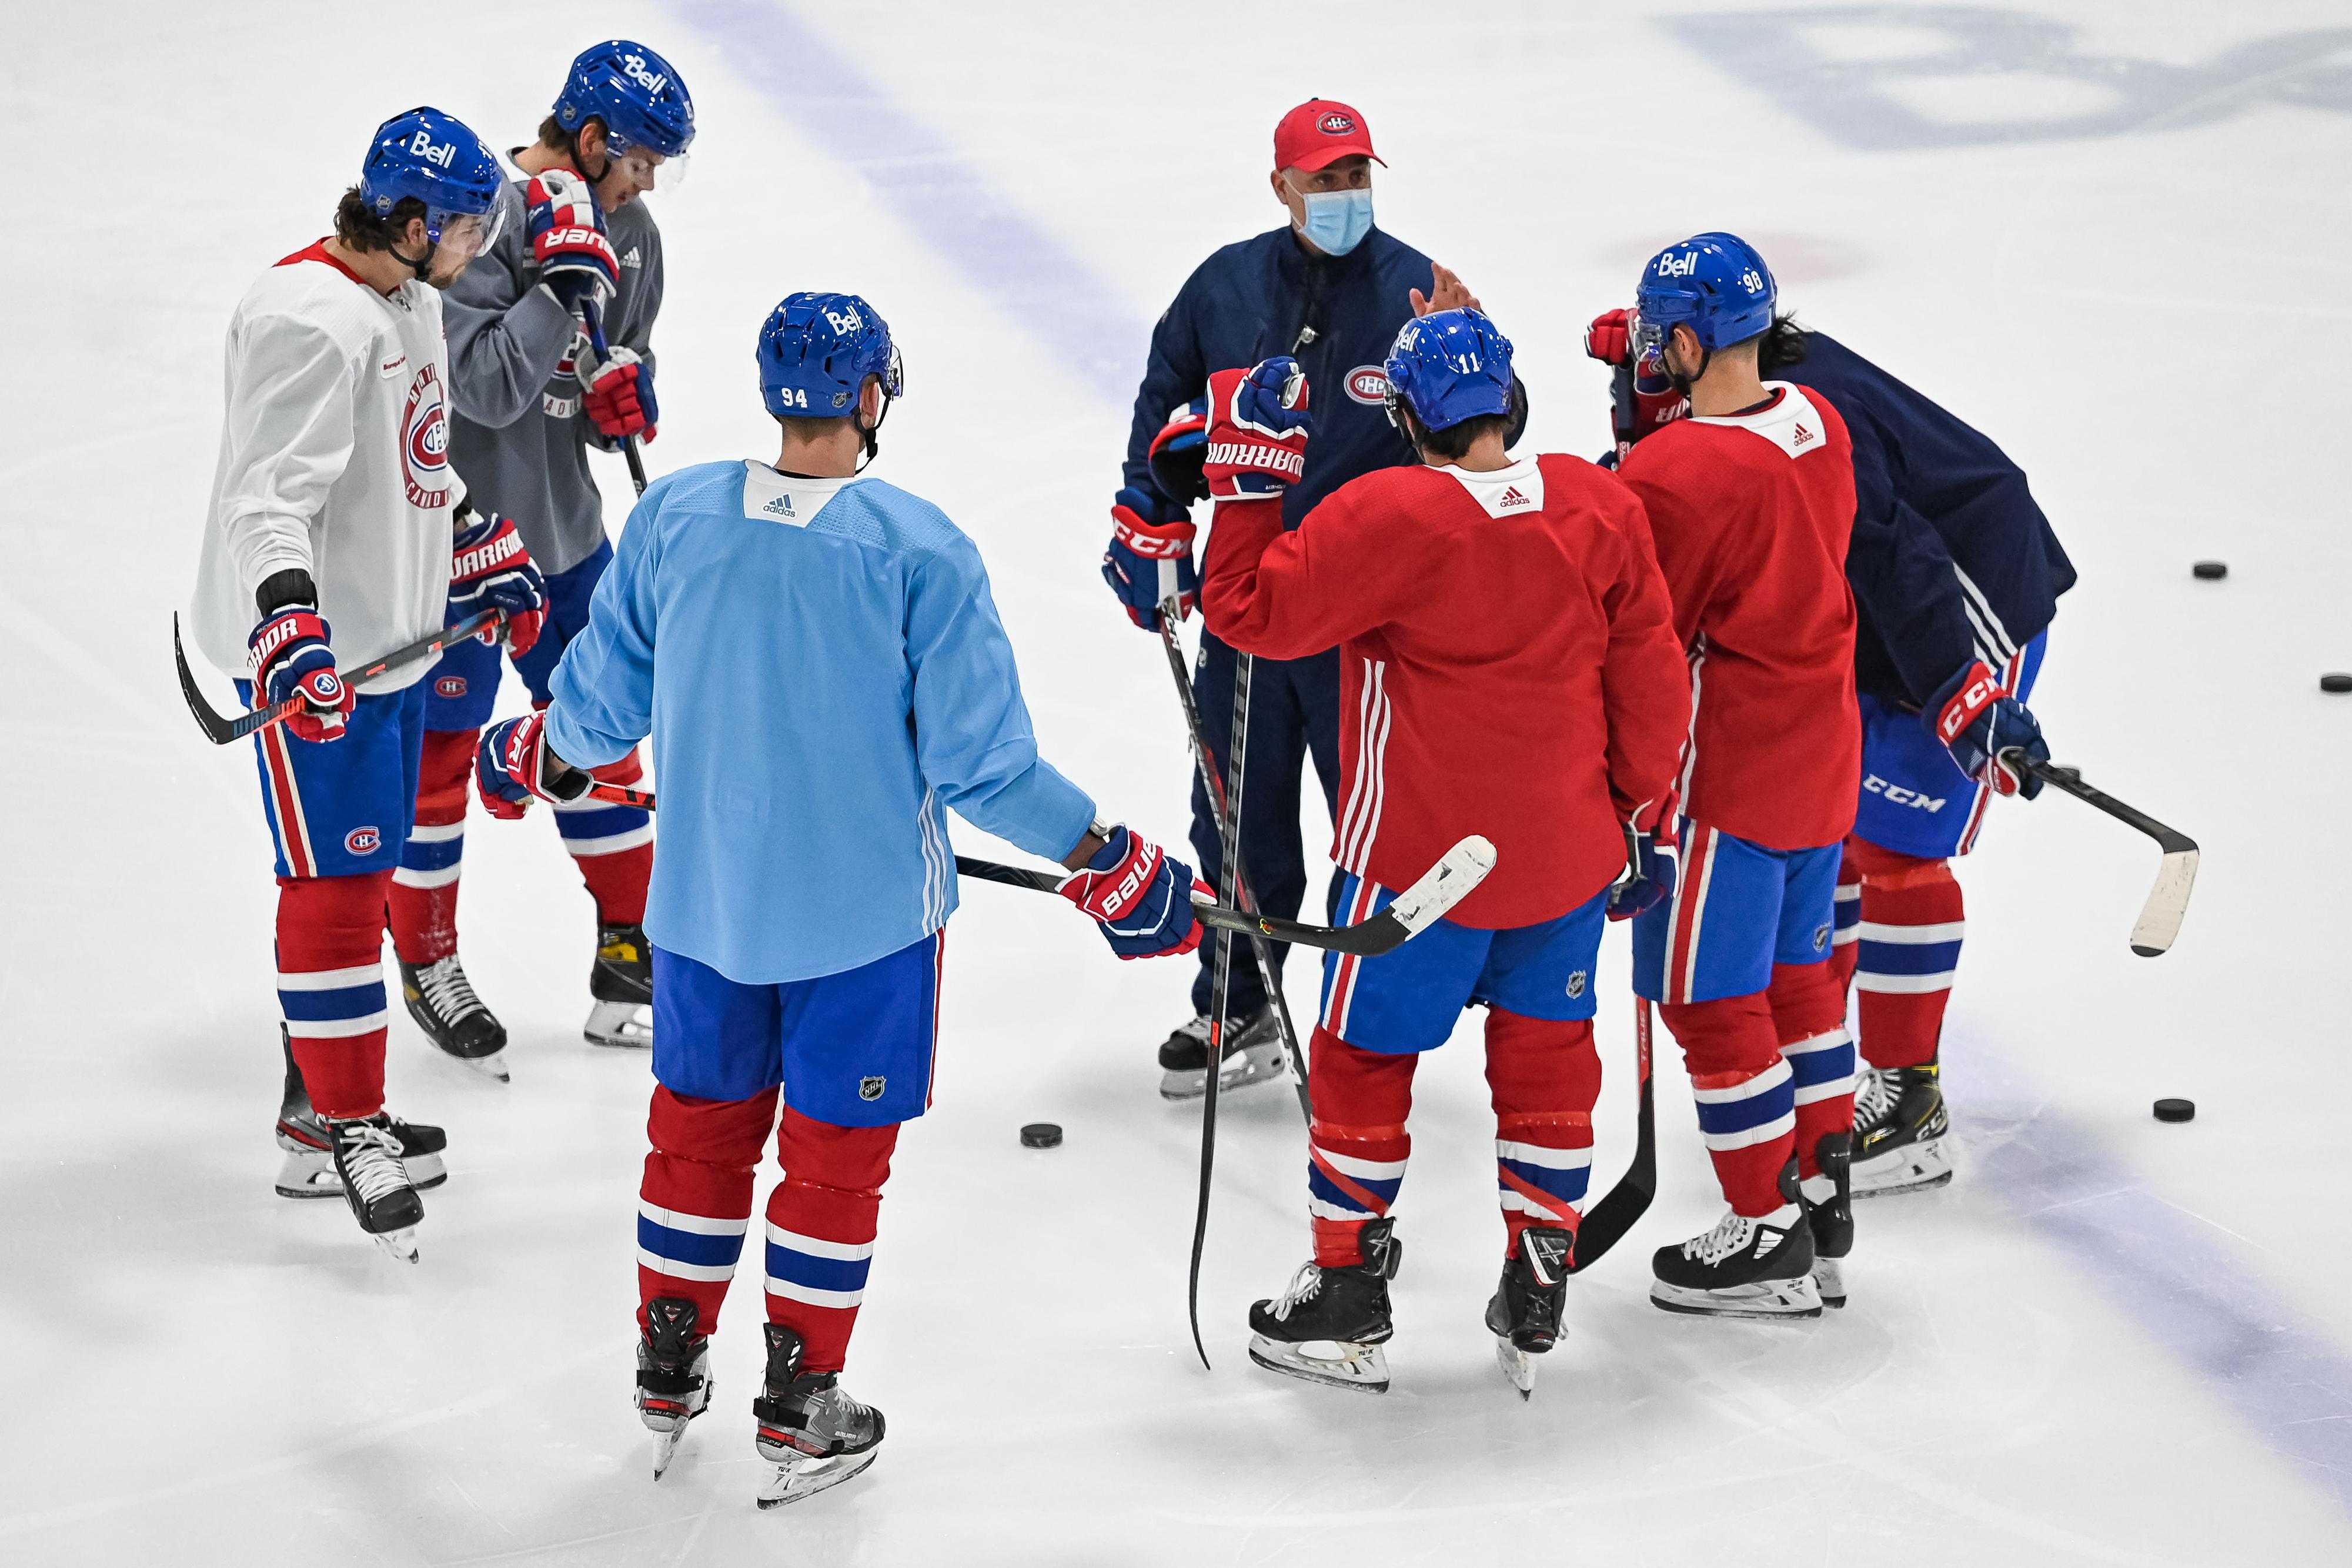 NHL: JAN 09 Canadiens Training Camp